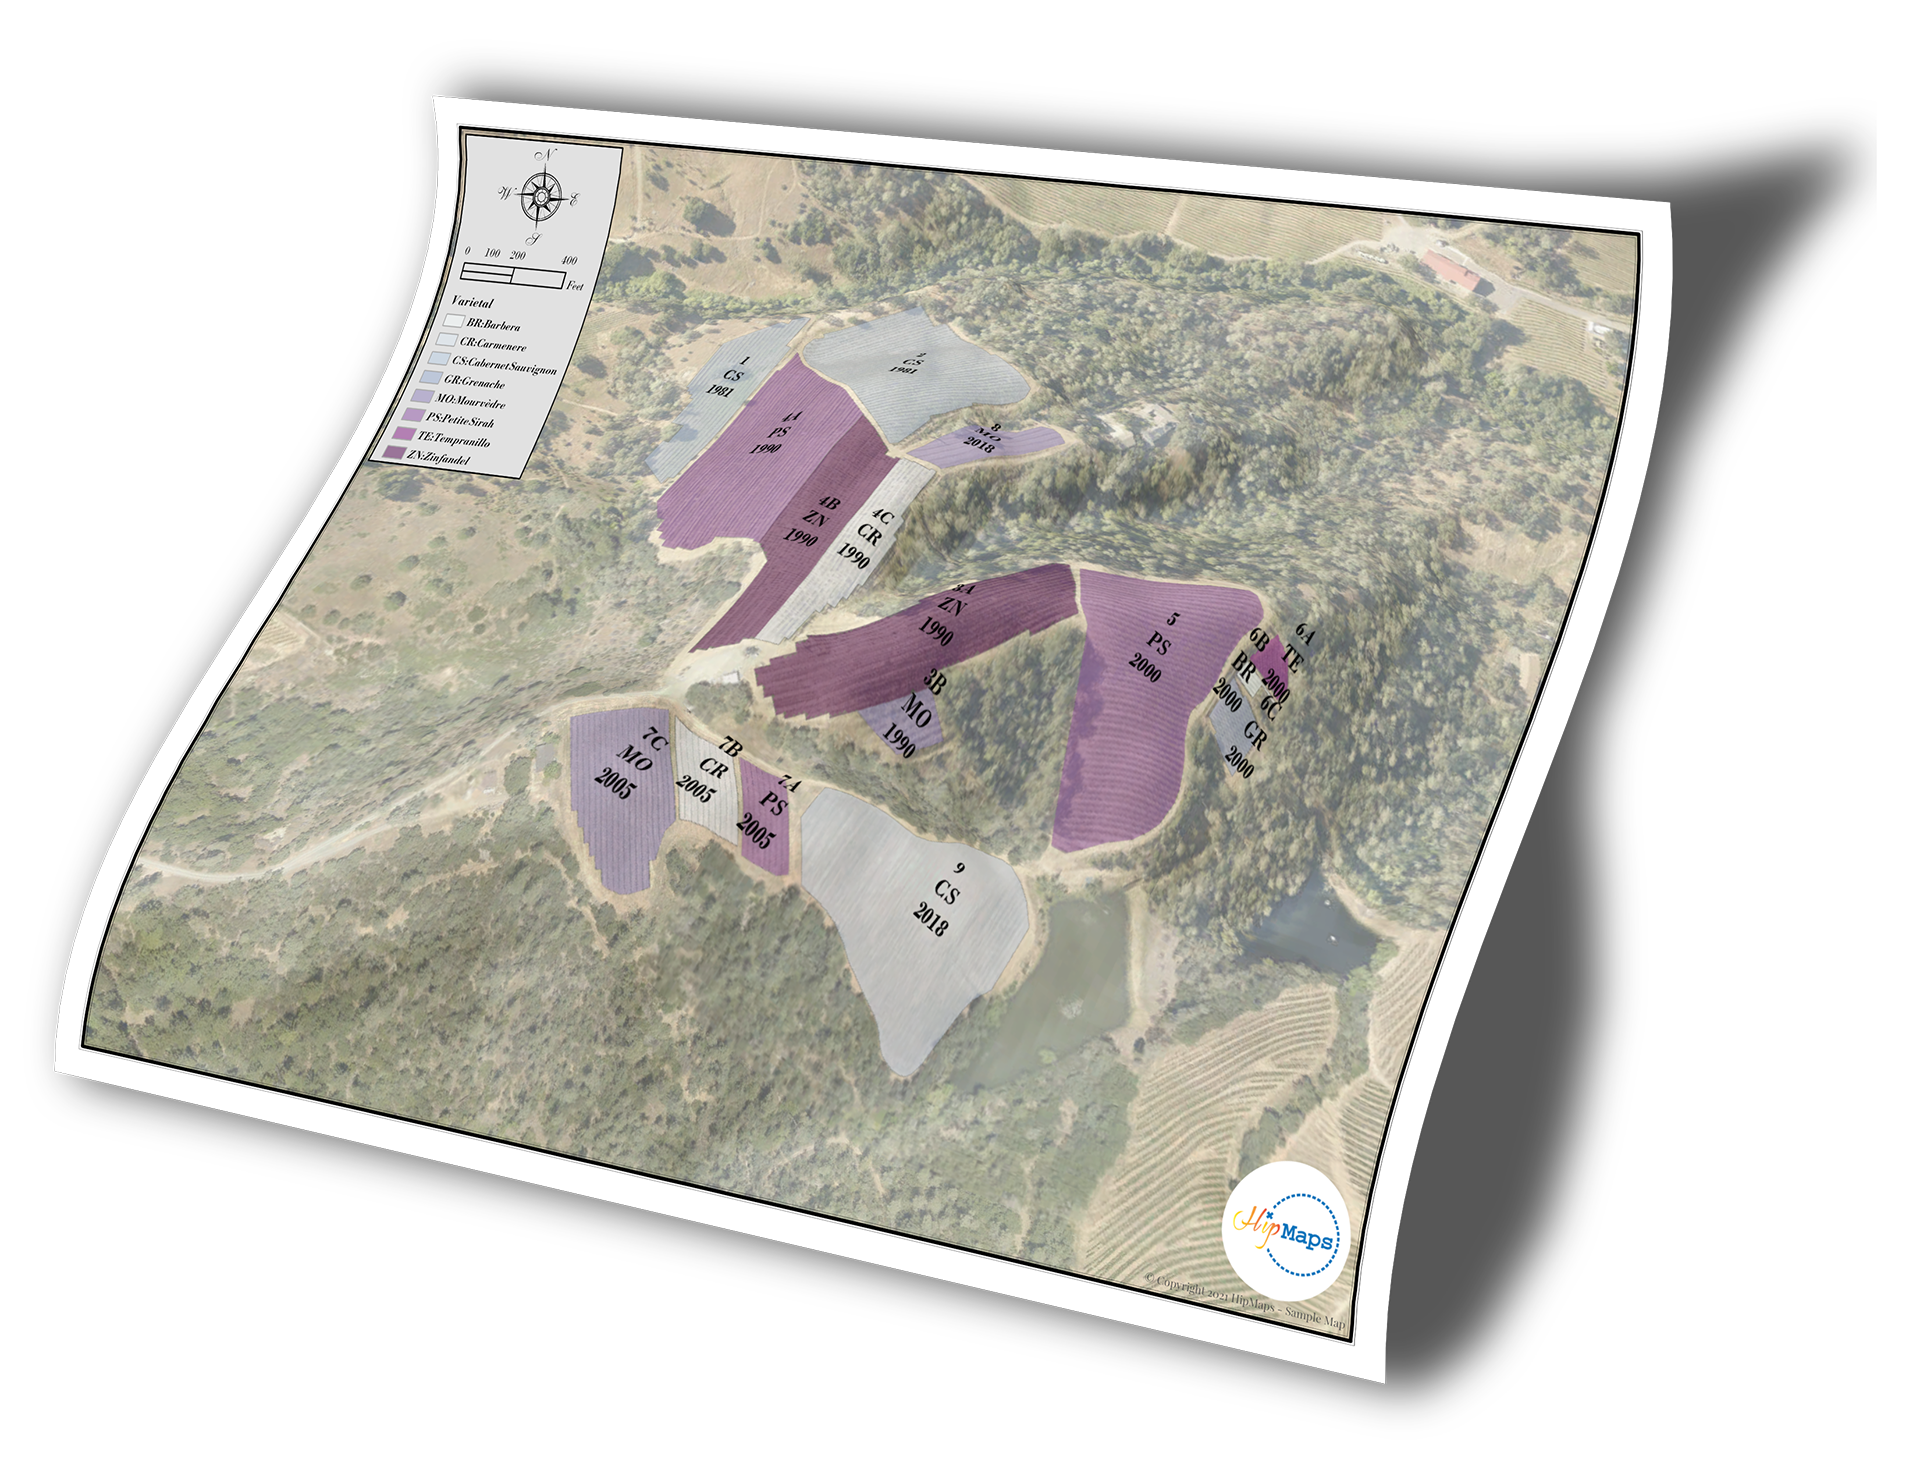 Winery-Vineyard AVA 3D map